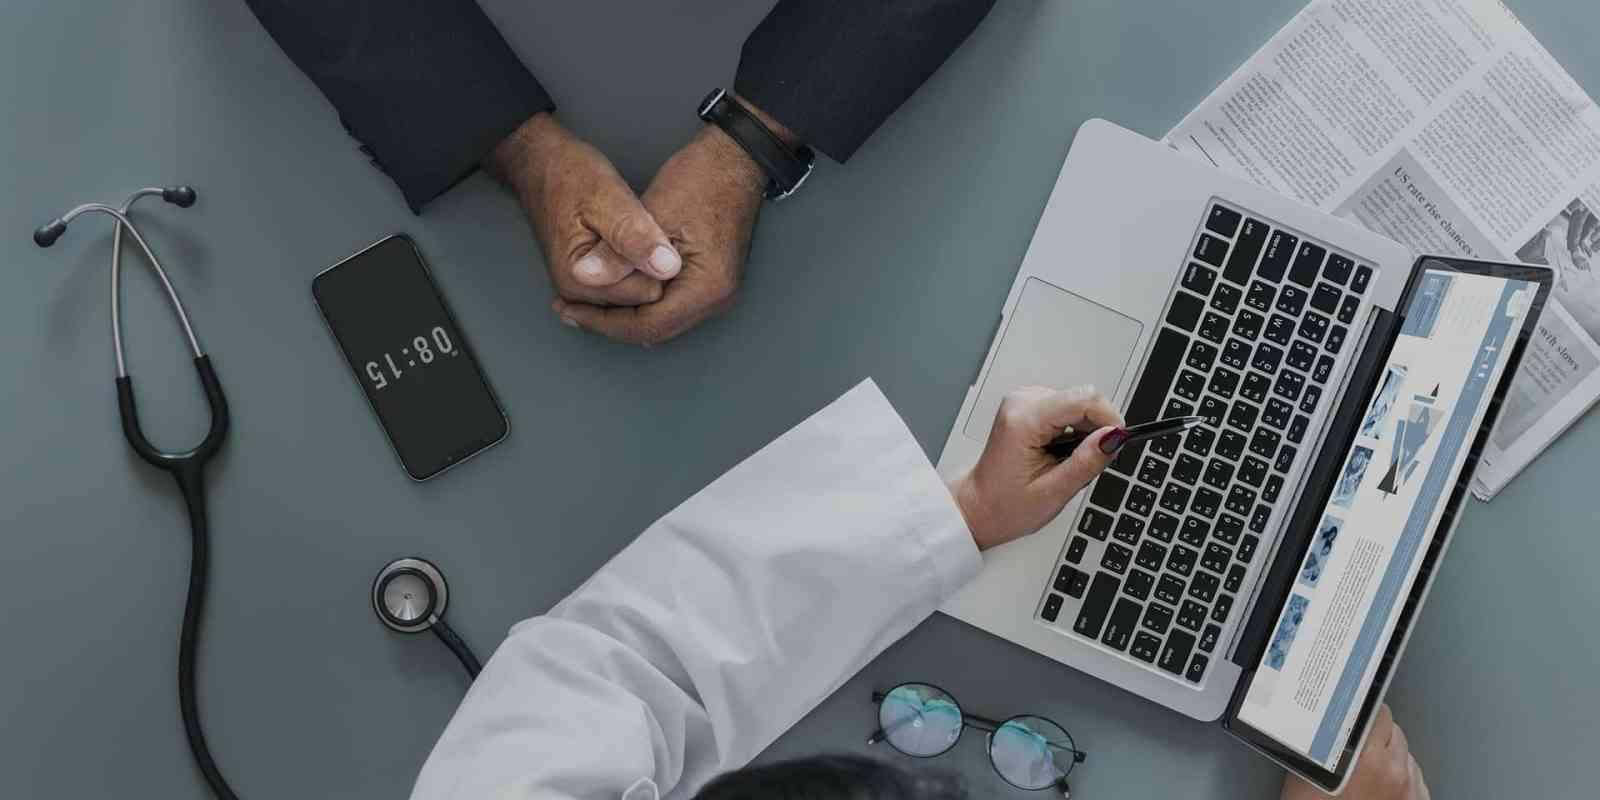 How to Get a Medical Sales Job?